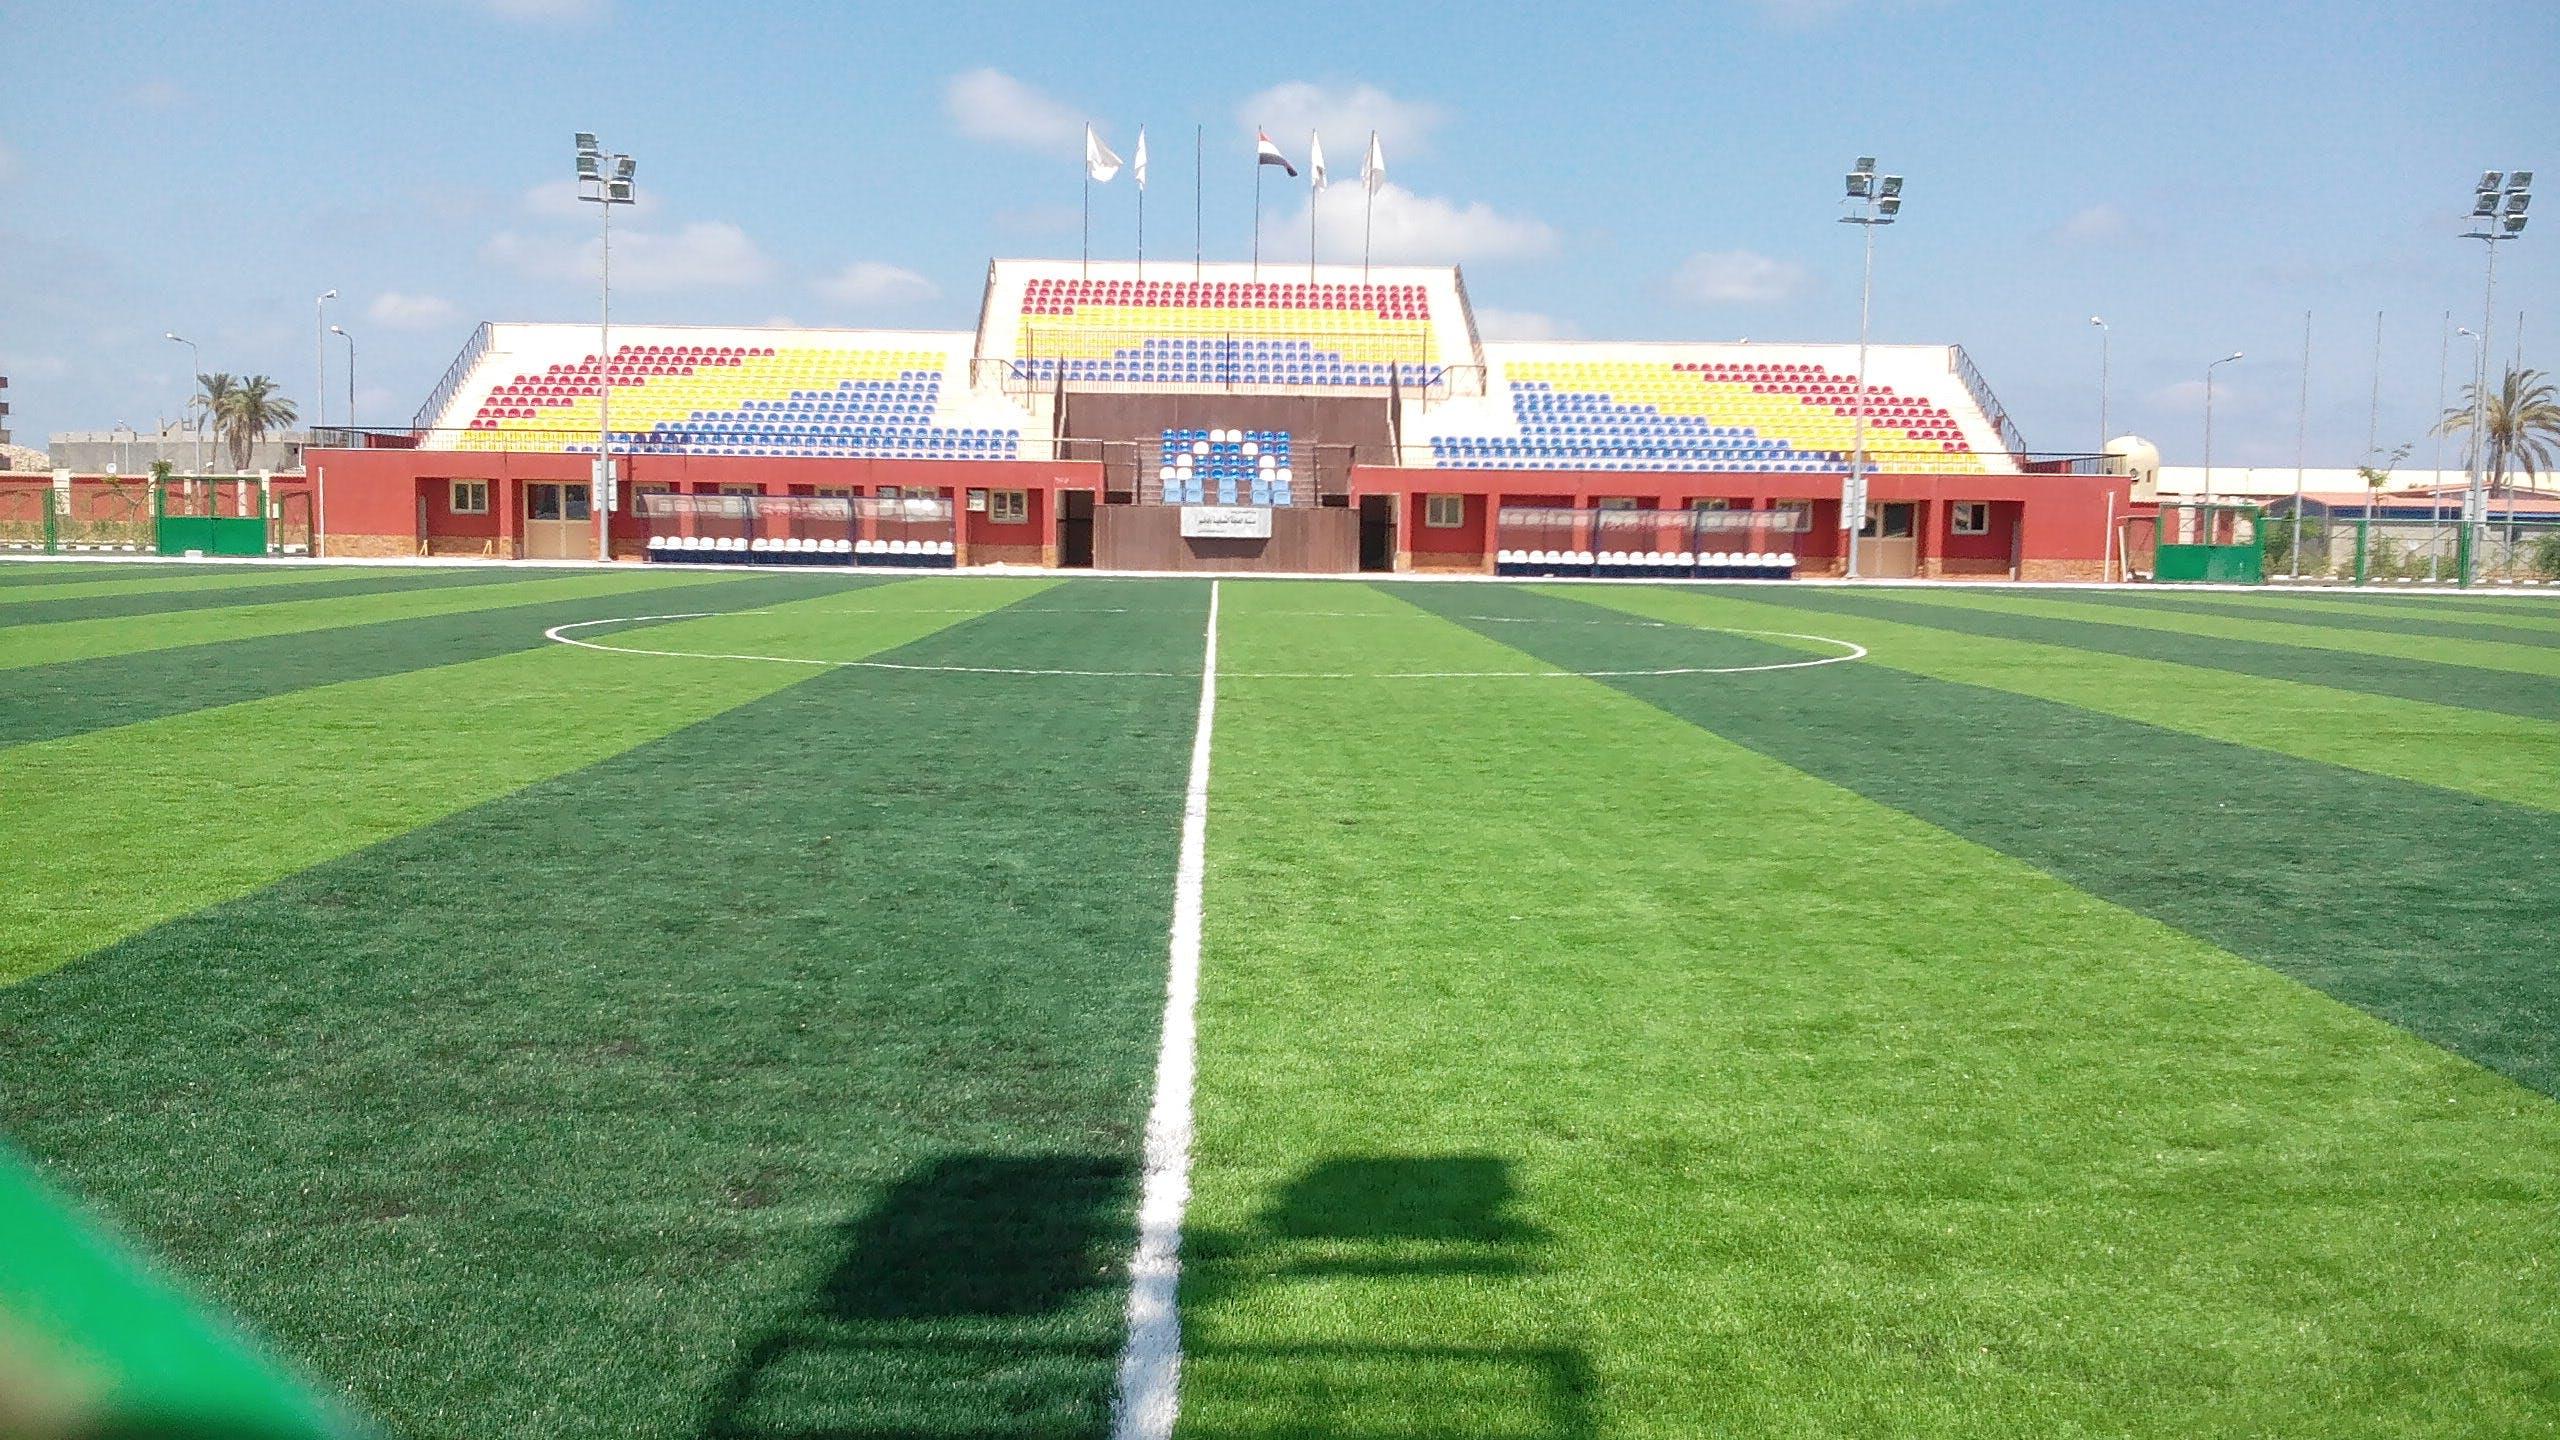 Free stock photo of football stadium, players